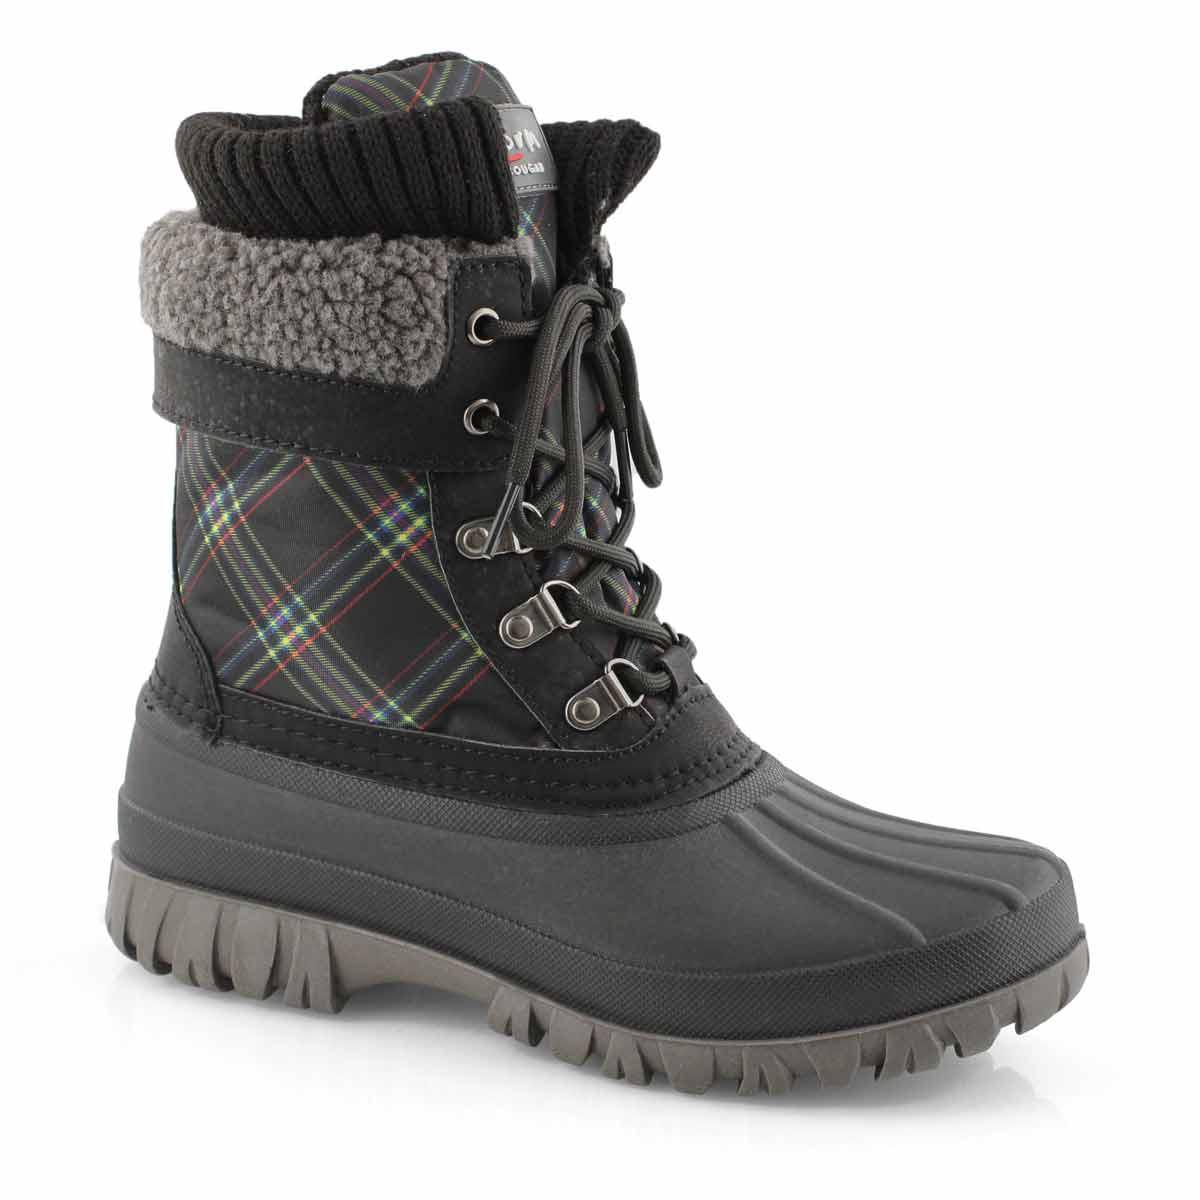 Women's CREEK blk bright plaid waterproof boots